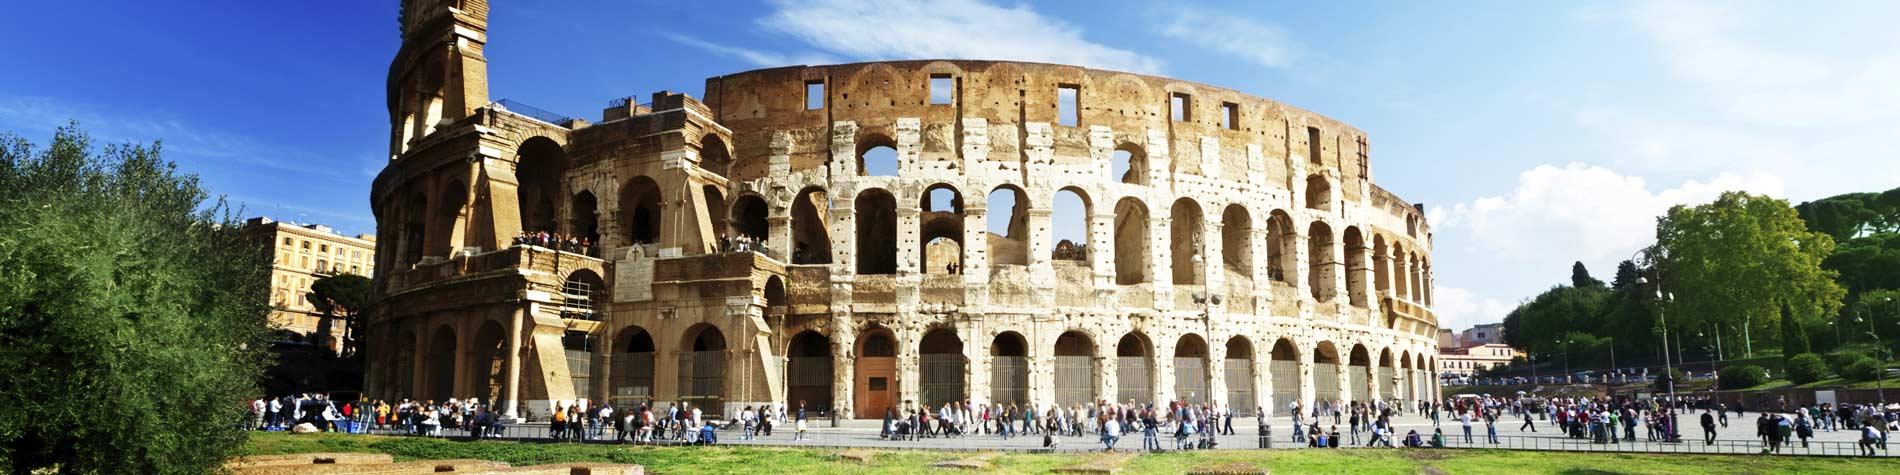 Cheap flights to Italy from €11.73 | Ryanair.com